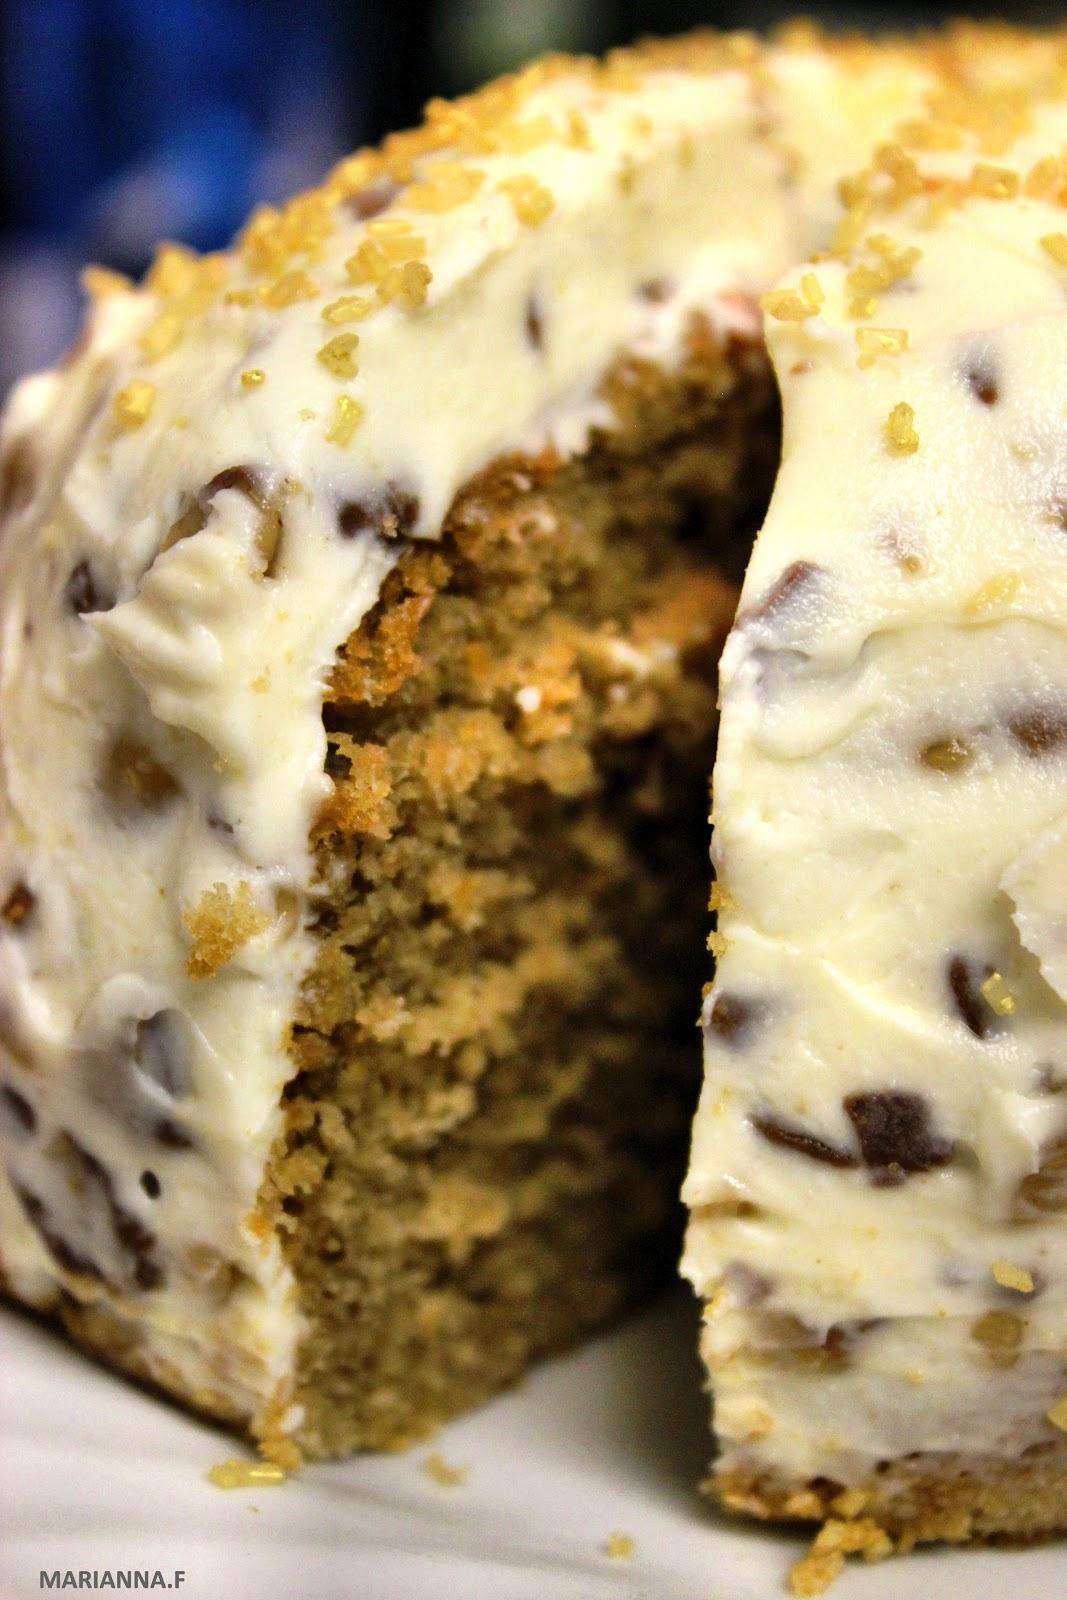 Swirl Amp Scramble Caramel Cake Amp Crunchy Chocolate Toffee